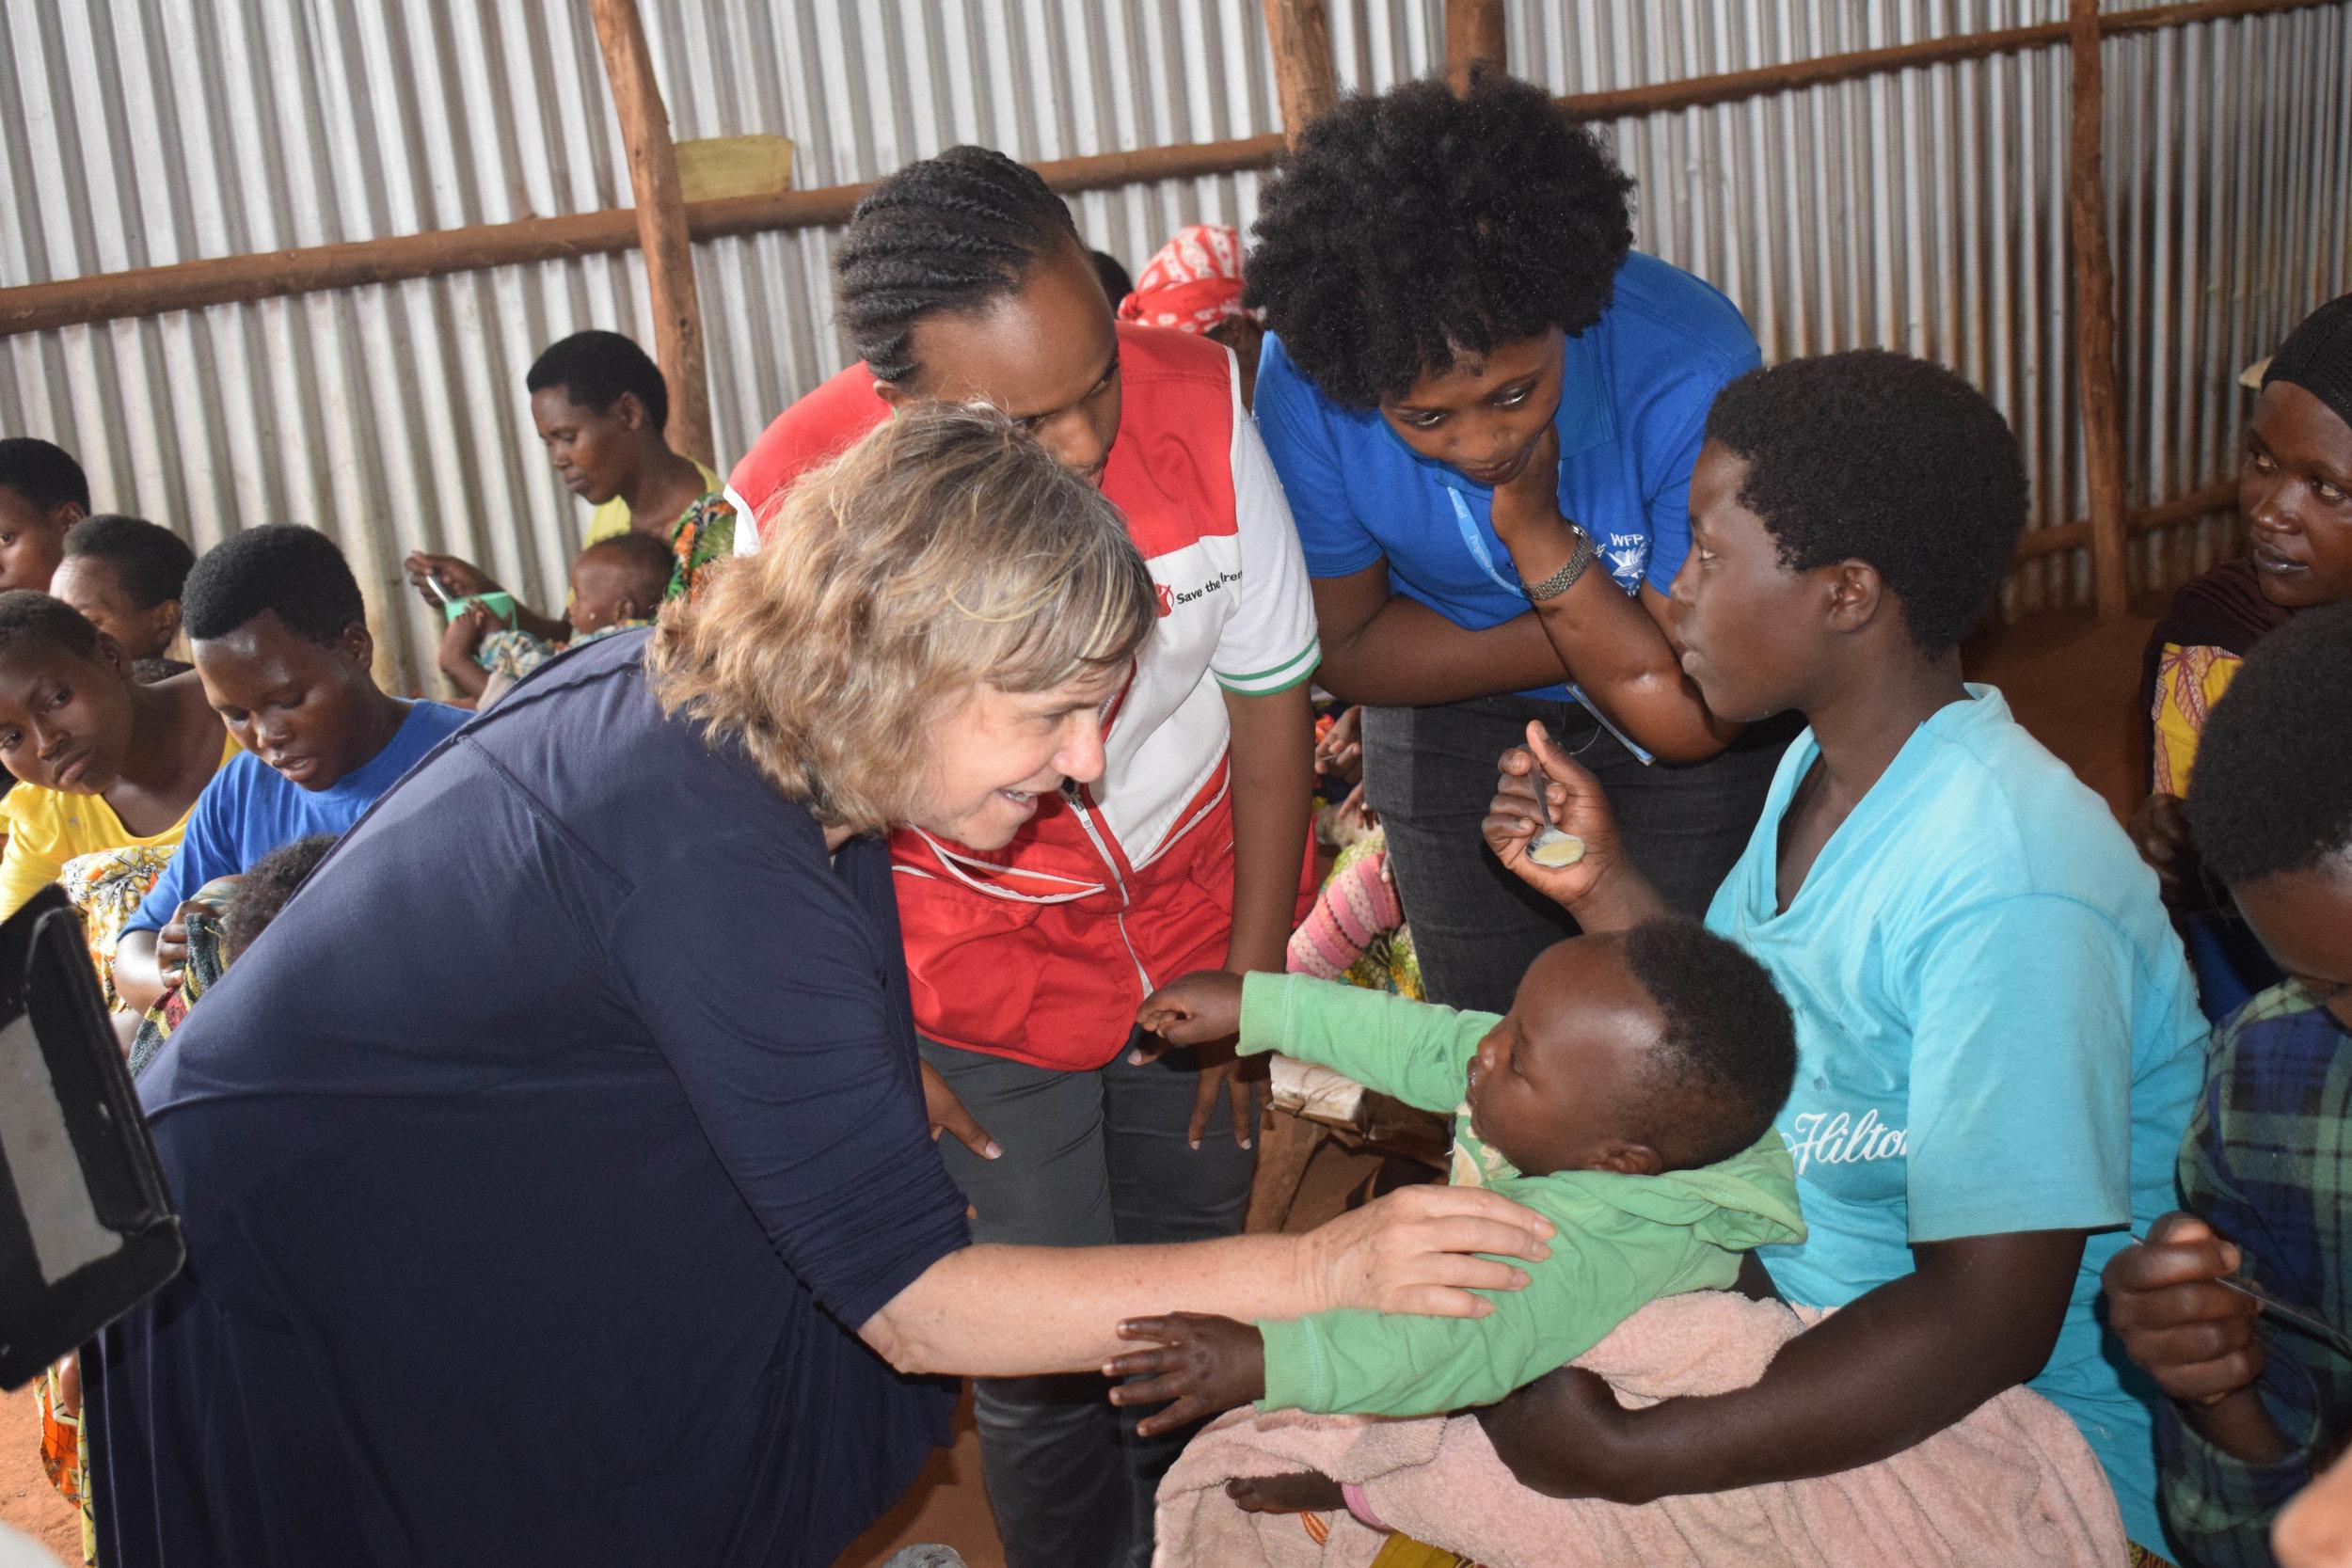 Mahama Refugee Camp – Rwanda 2018 (Photo by Bosco Muyinda)